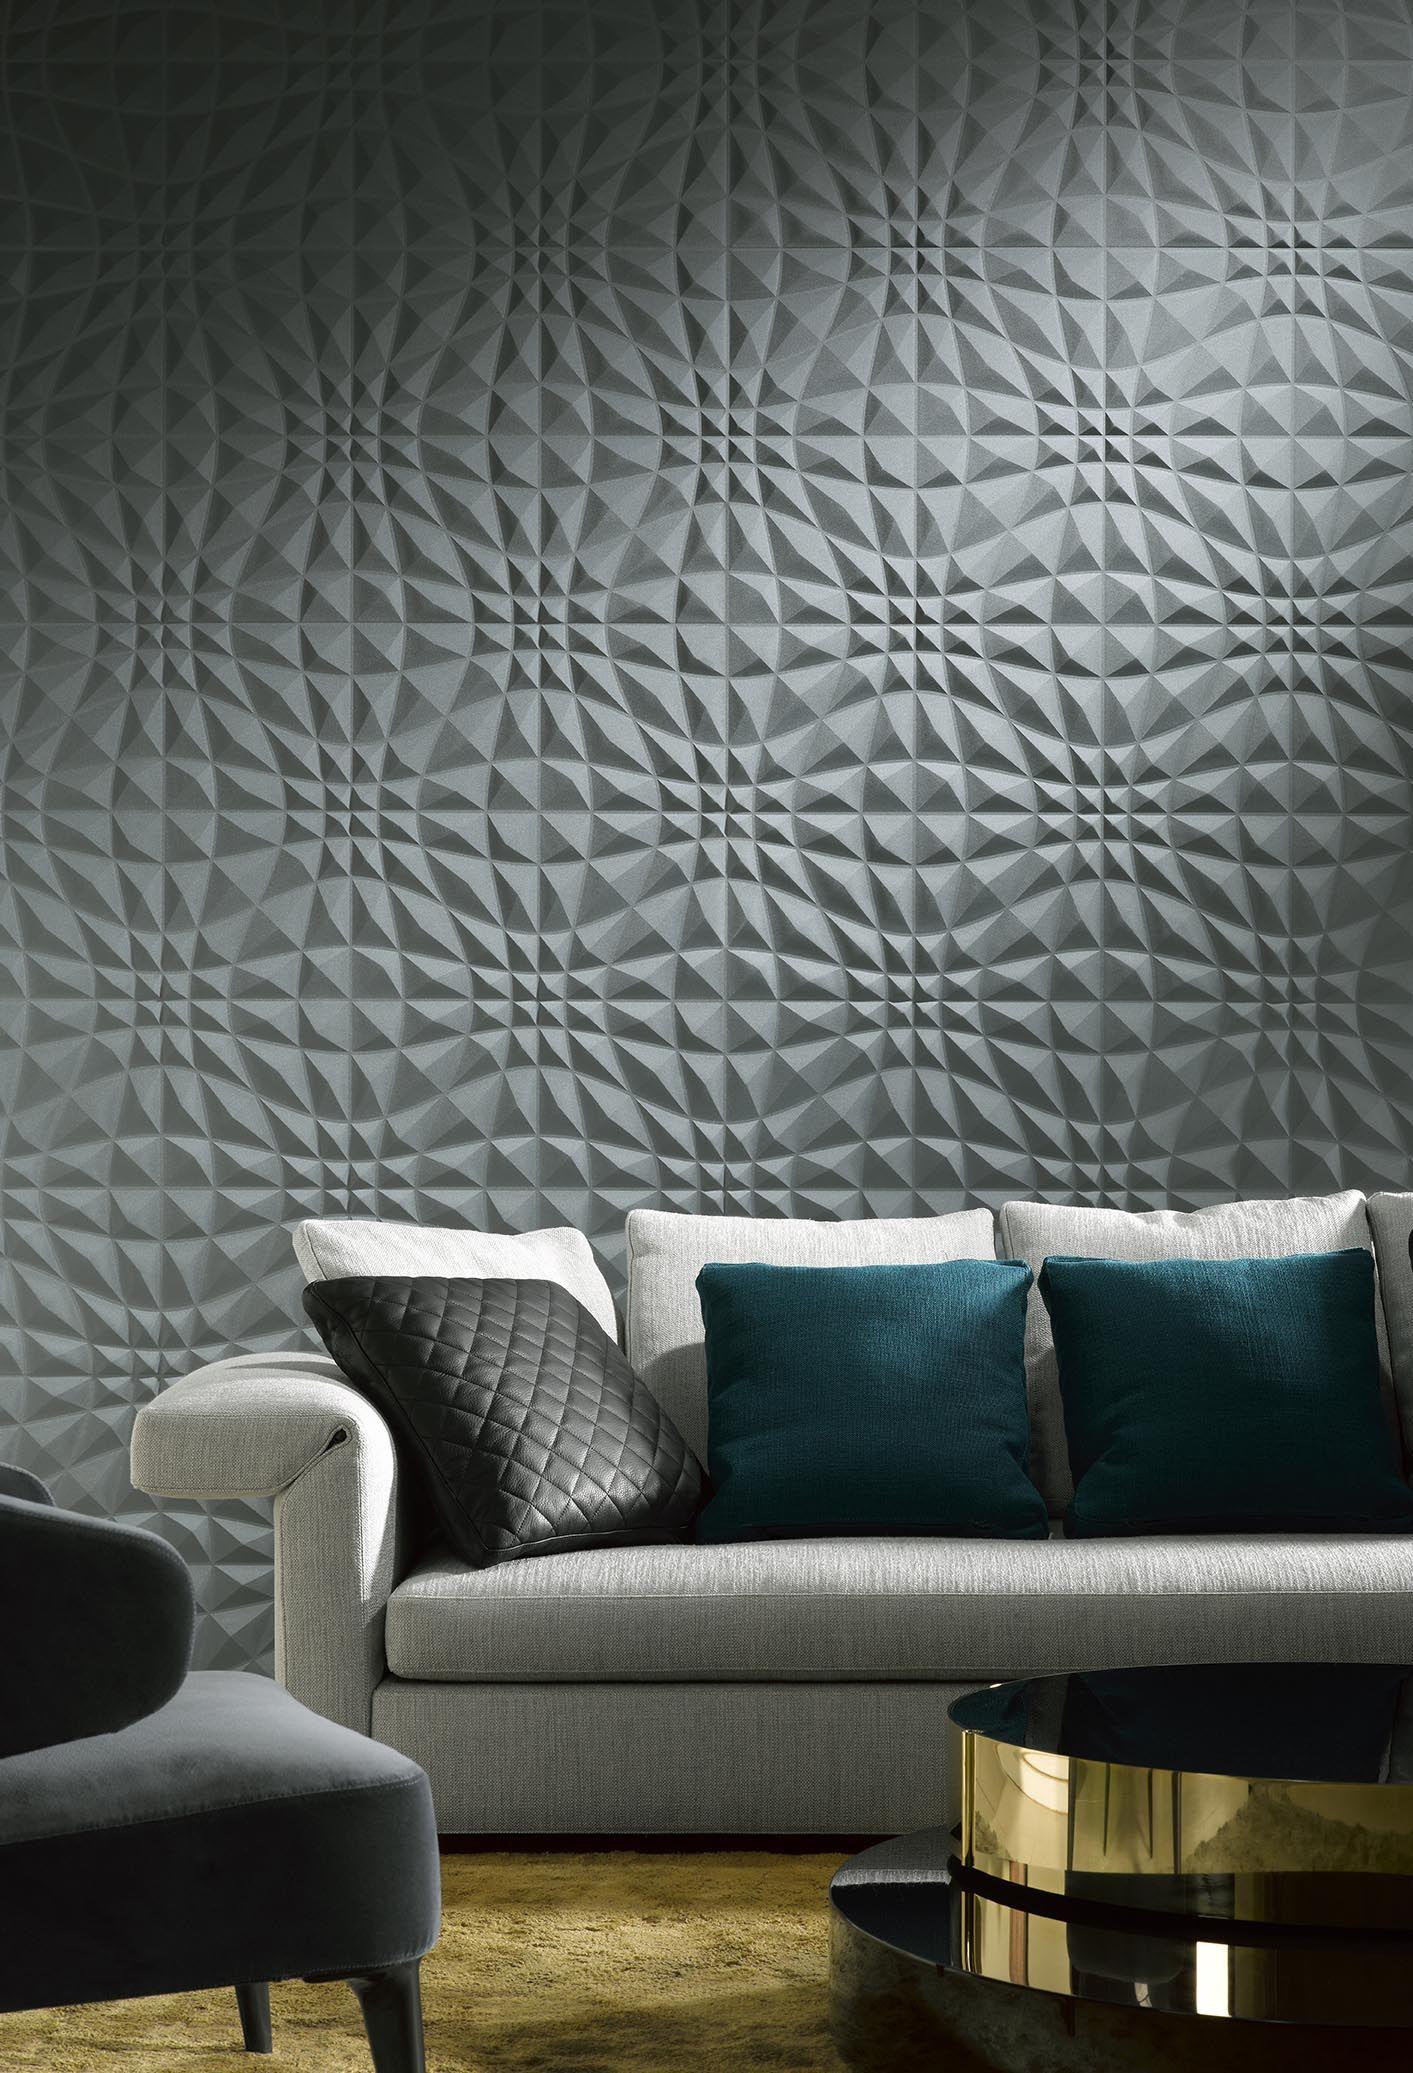 enigma flex wallpaper en30500 urbane living interior design wallpaper wall covering interior design wallpaper wall covering